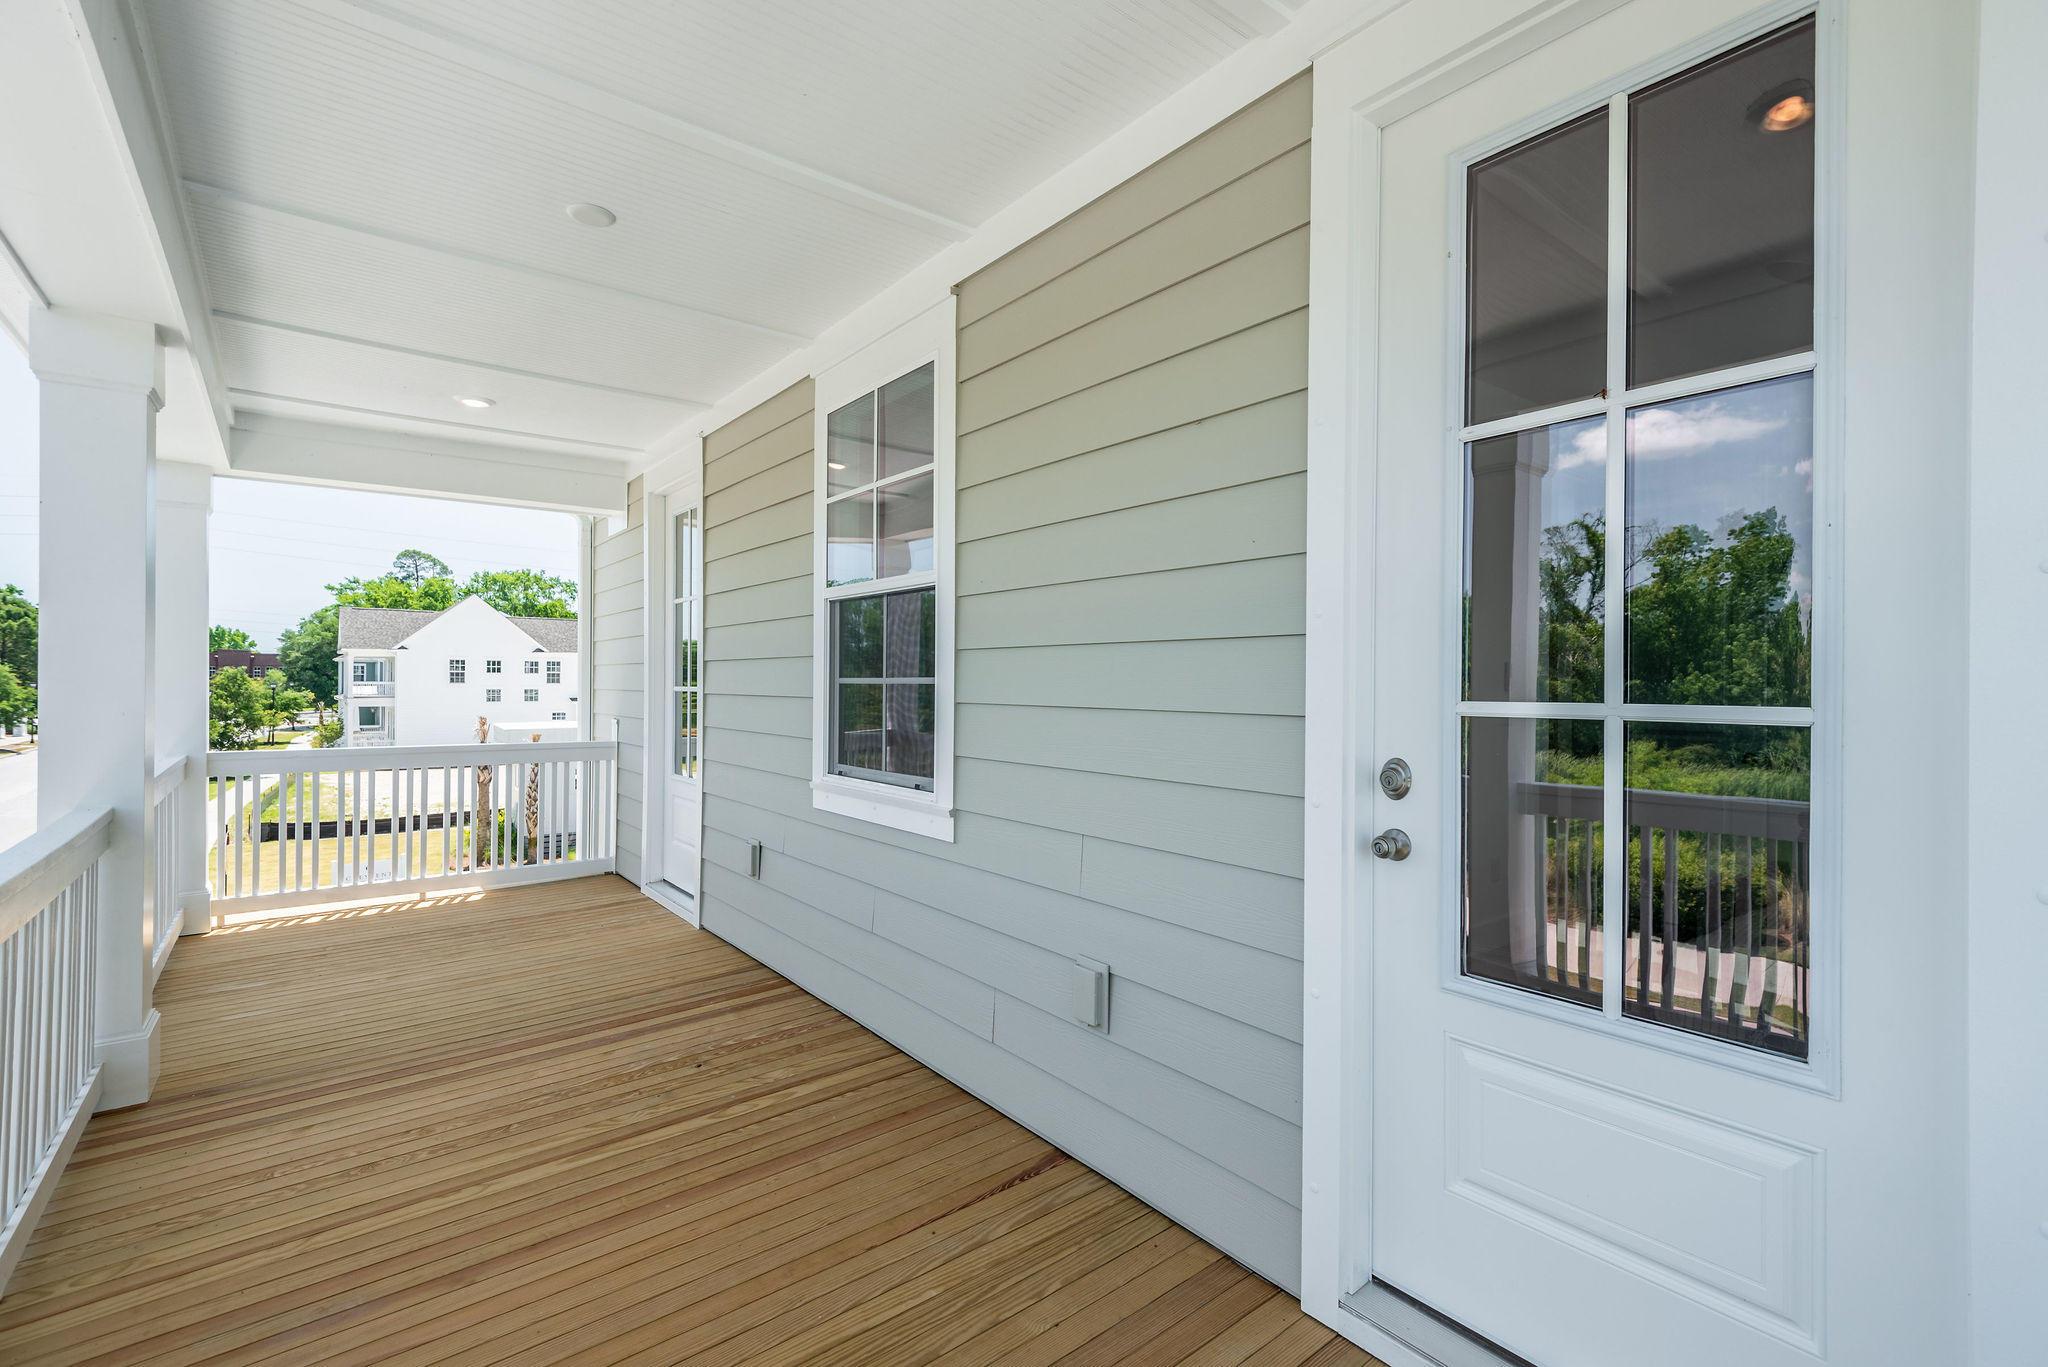 Midtown Homes For Sale - 1344 Upper Union, Mount Pleasant, SC - 32